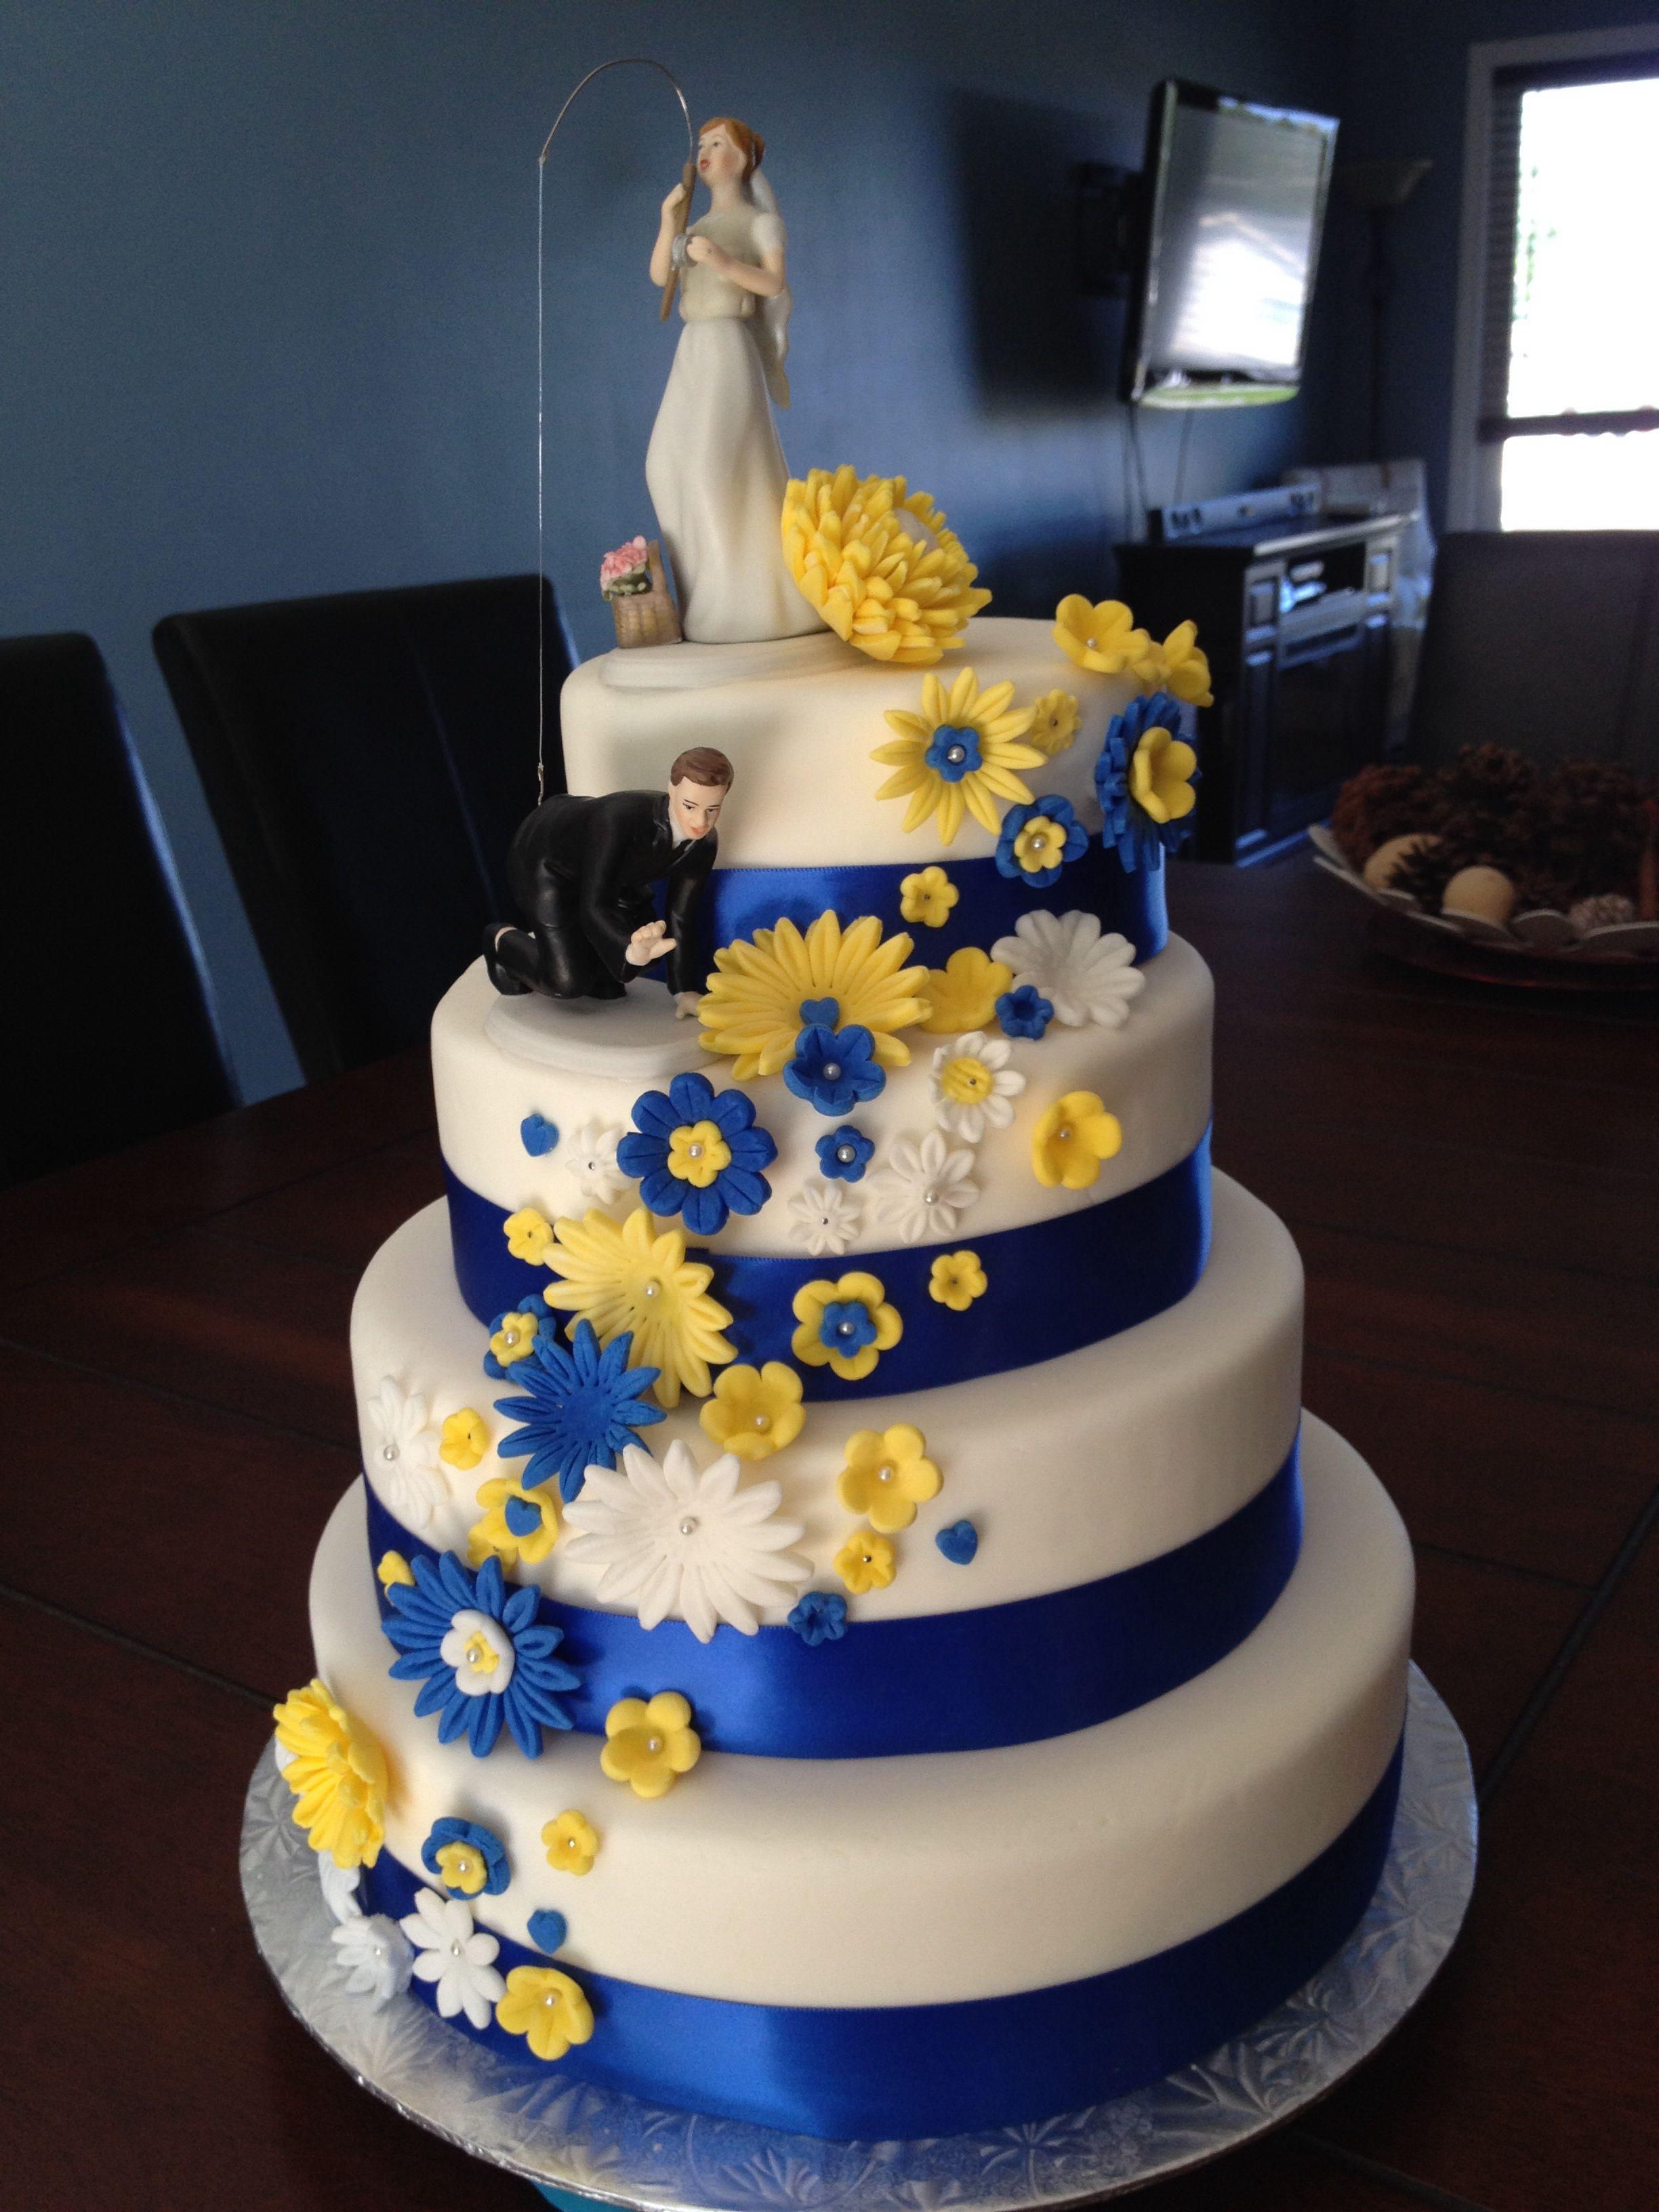 Fishing themed wedding cake i made for my cousins wedding